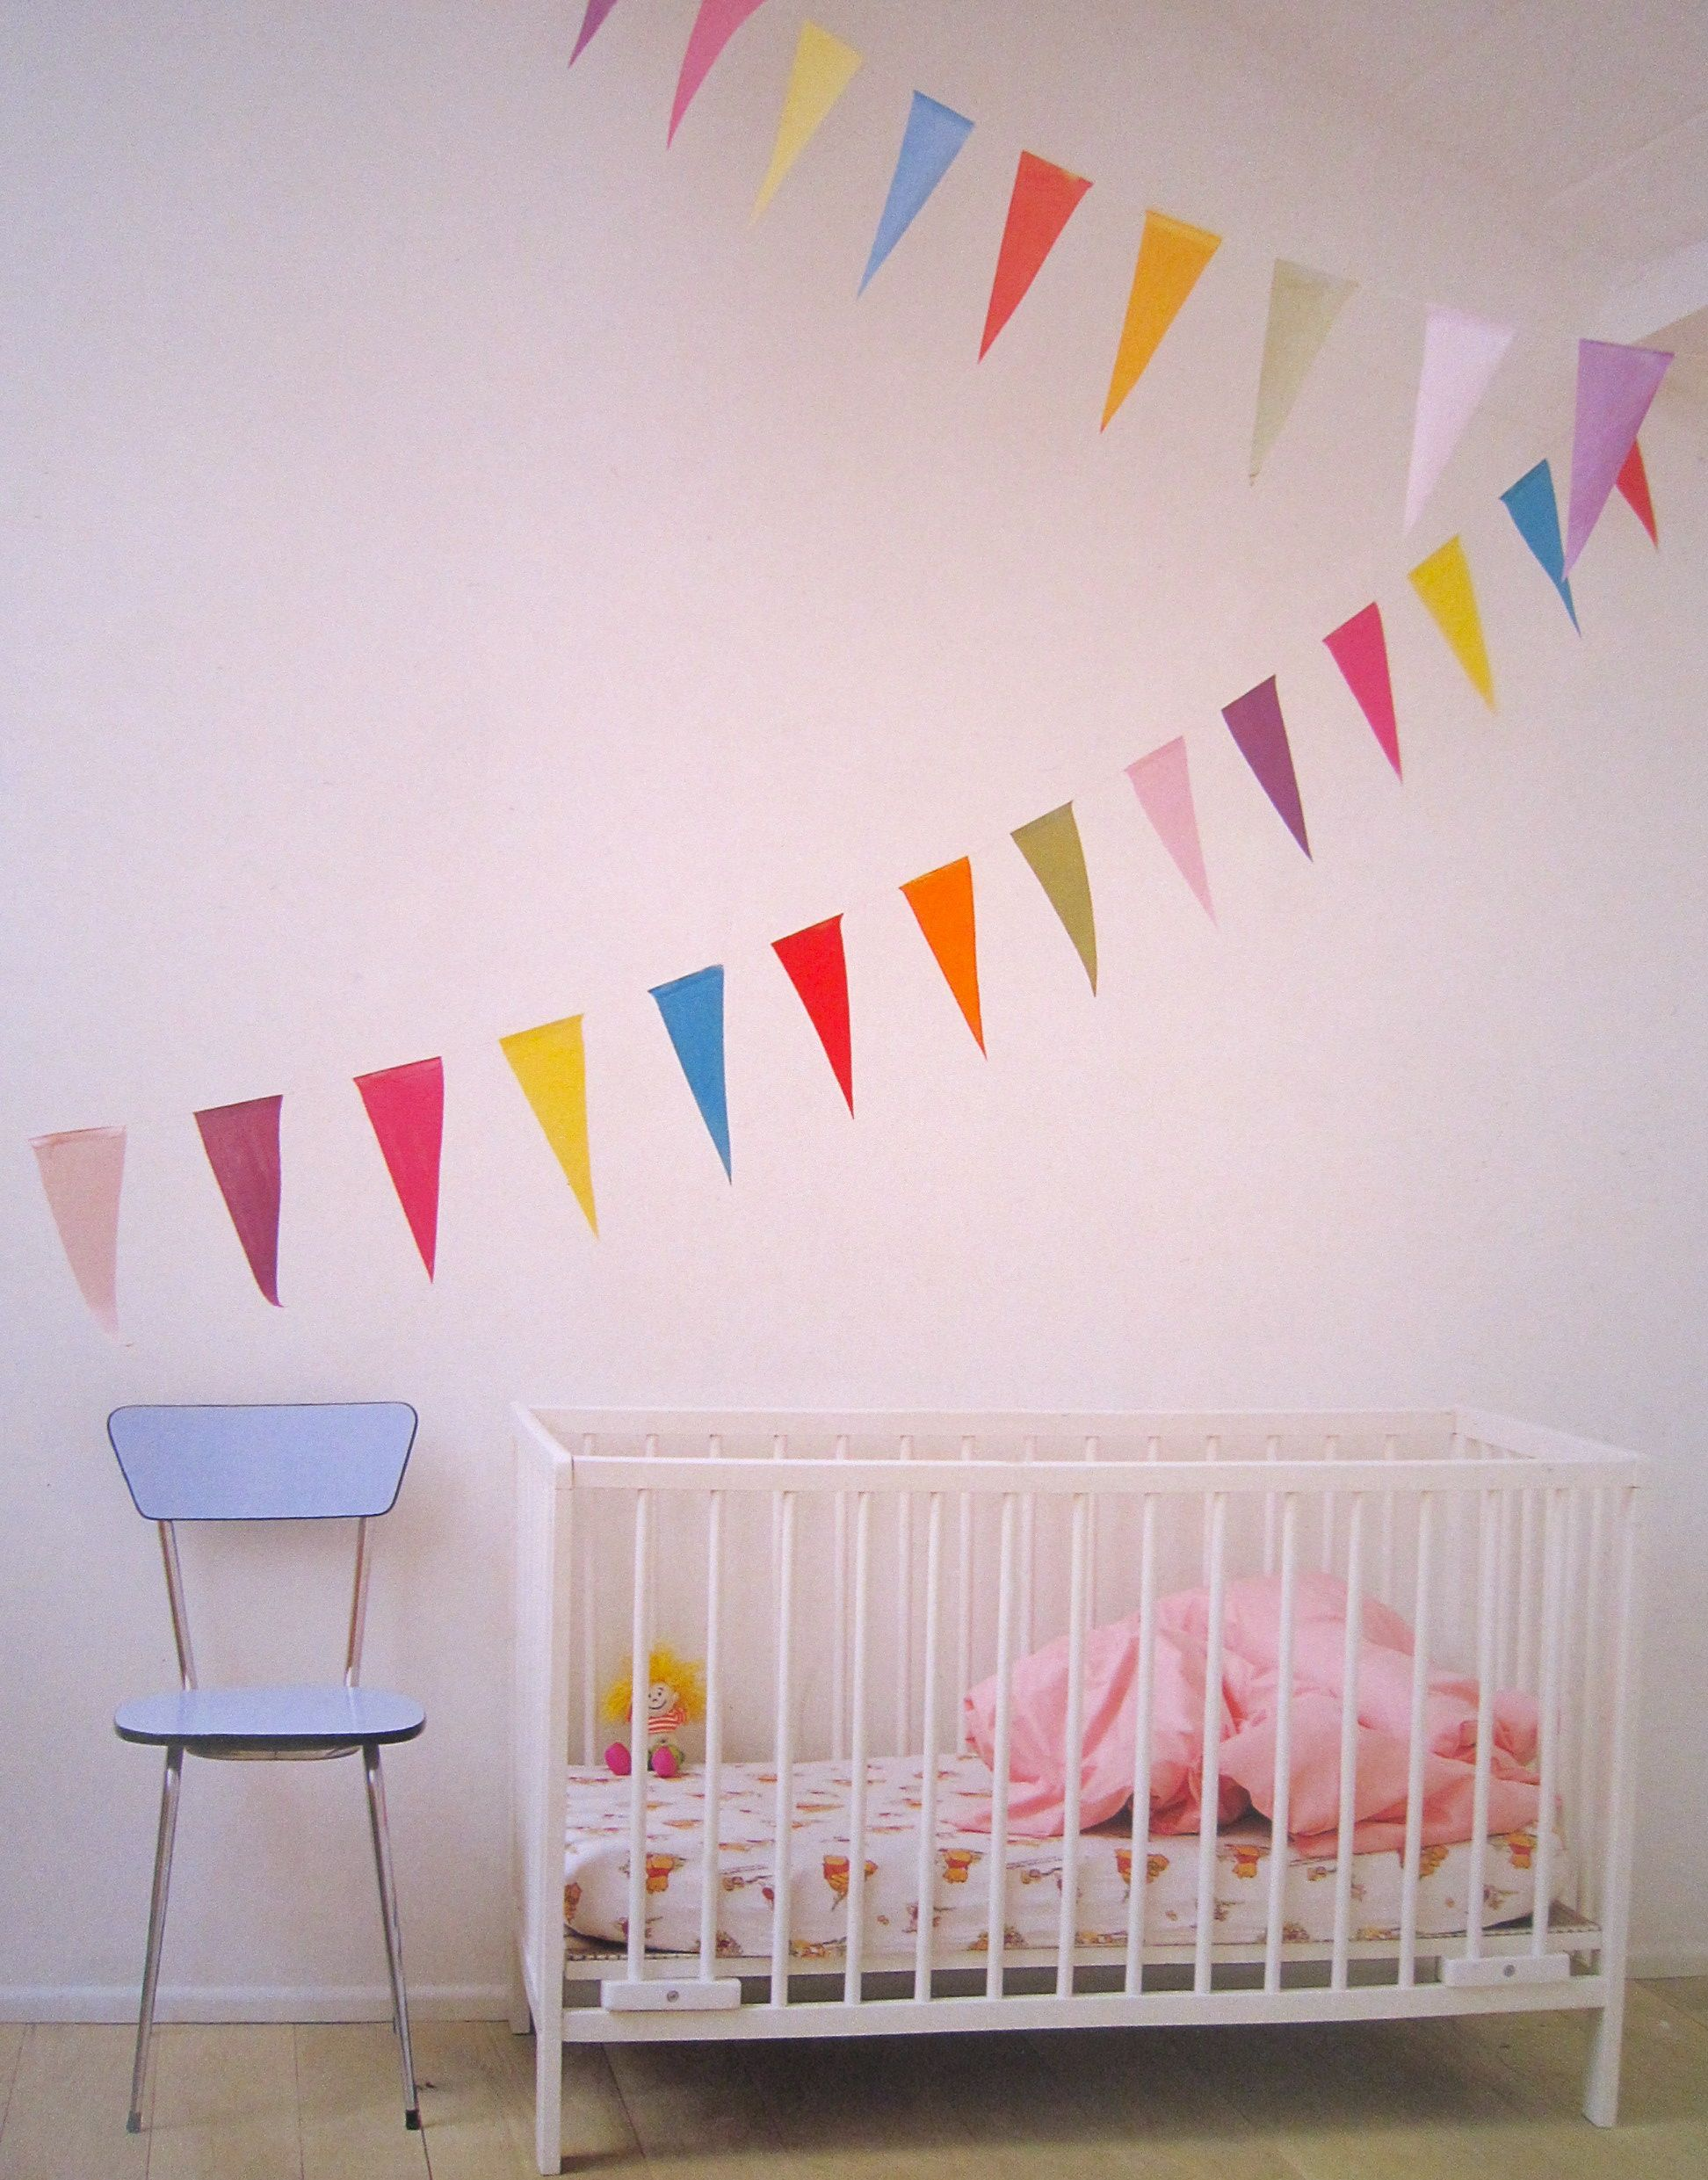 White nursery with rainbow bunting.